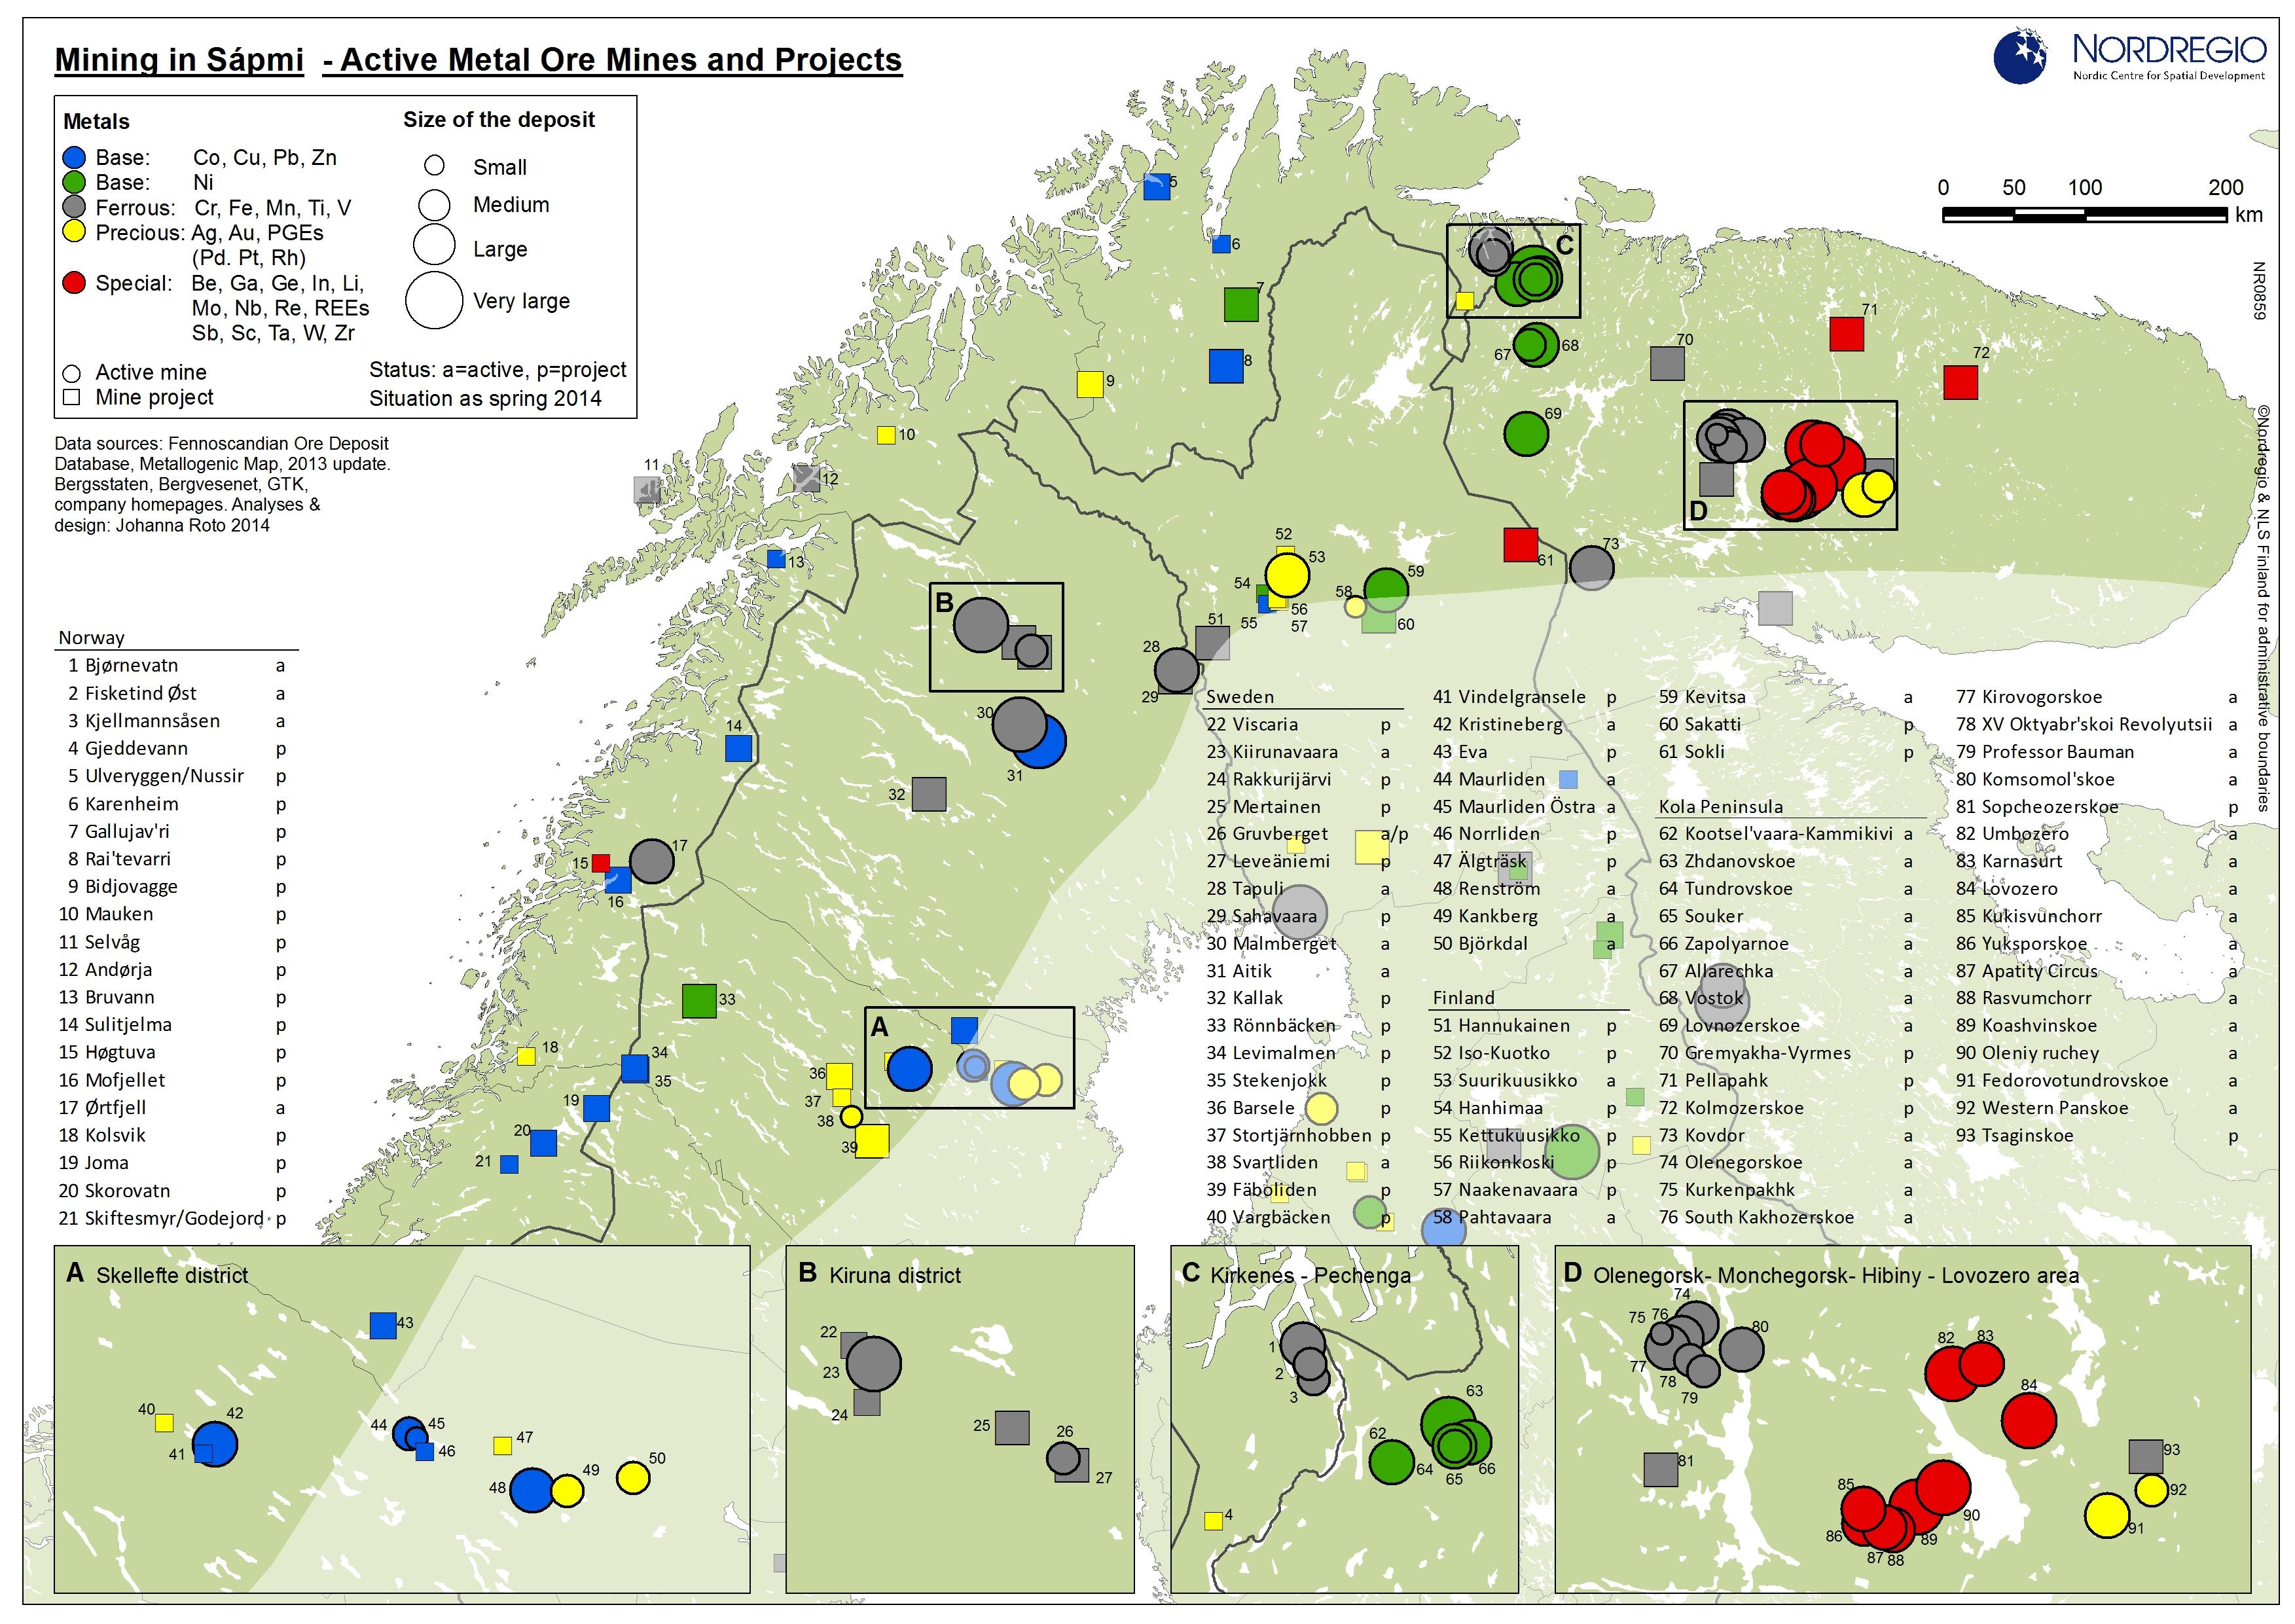 Nordregio mining bitcoins north carolina vs kentucky betting line